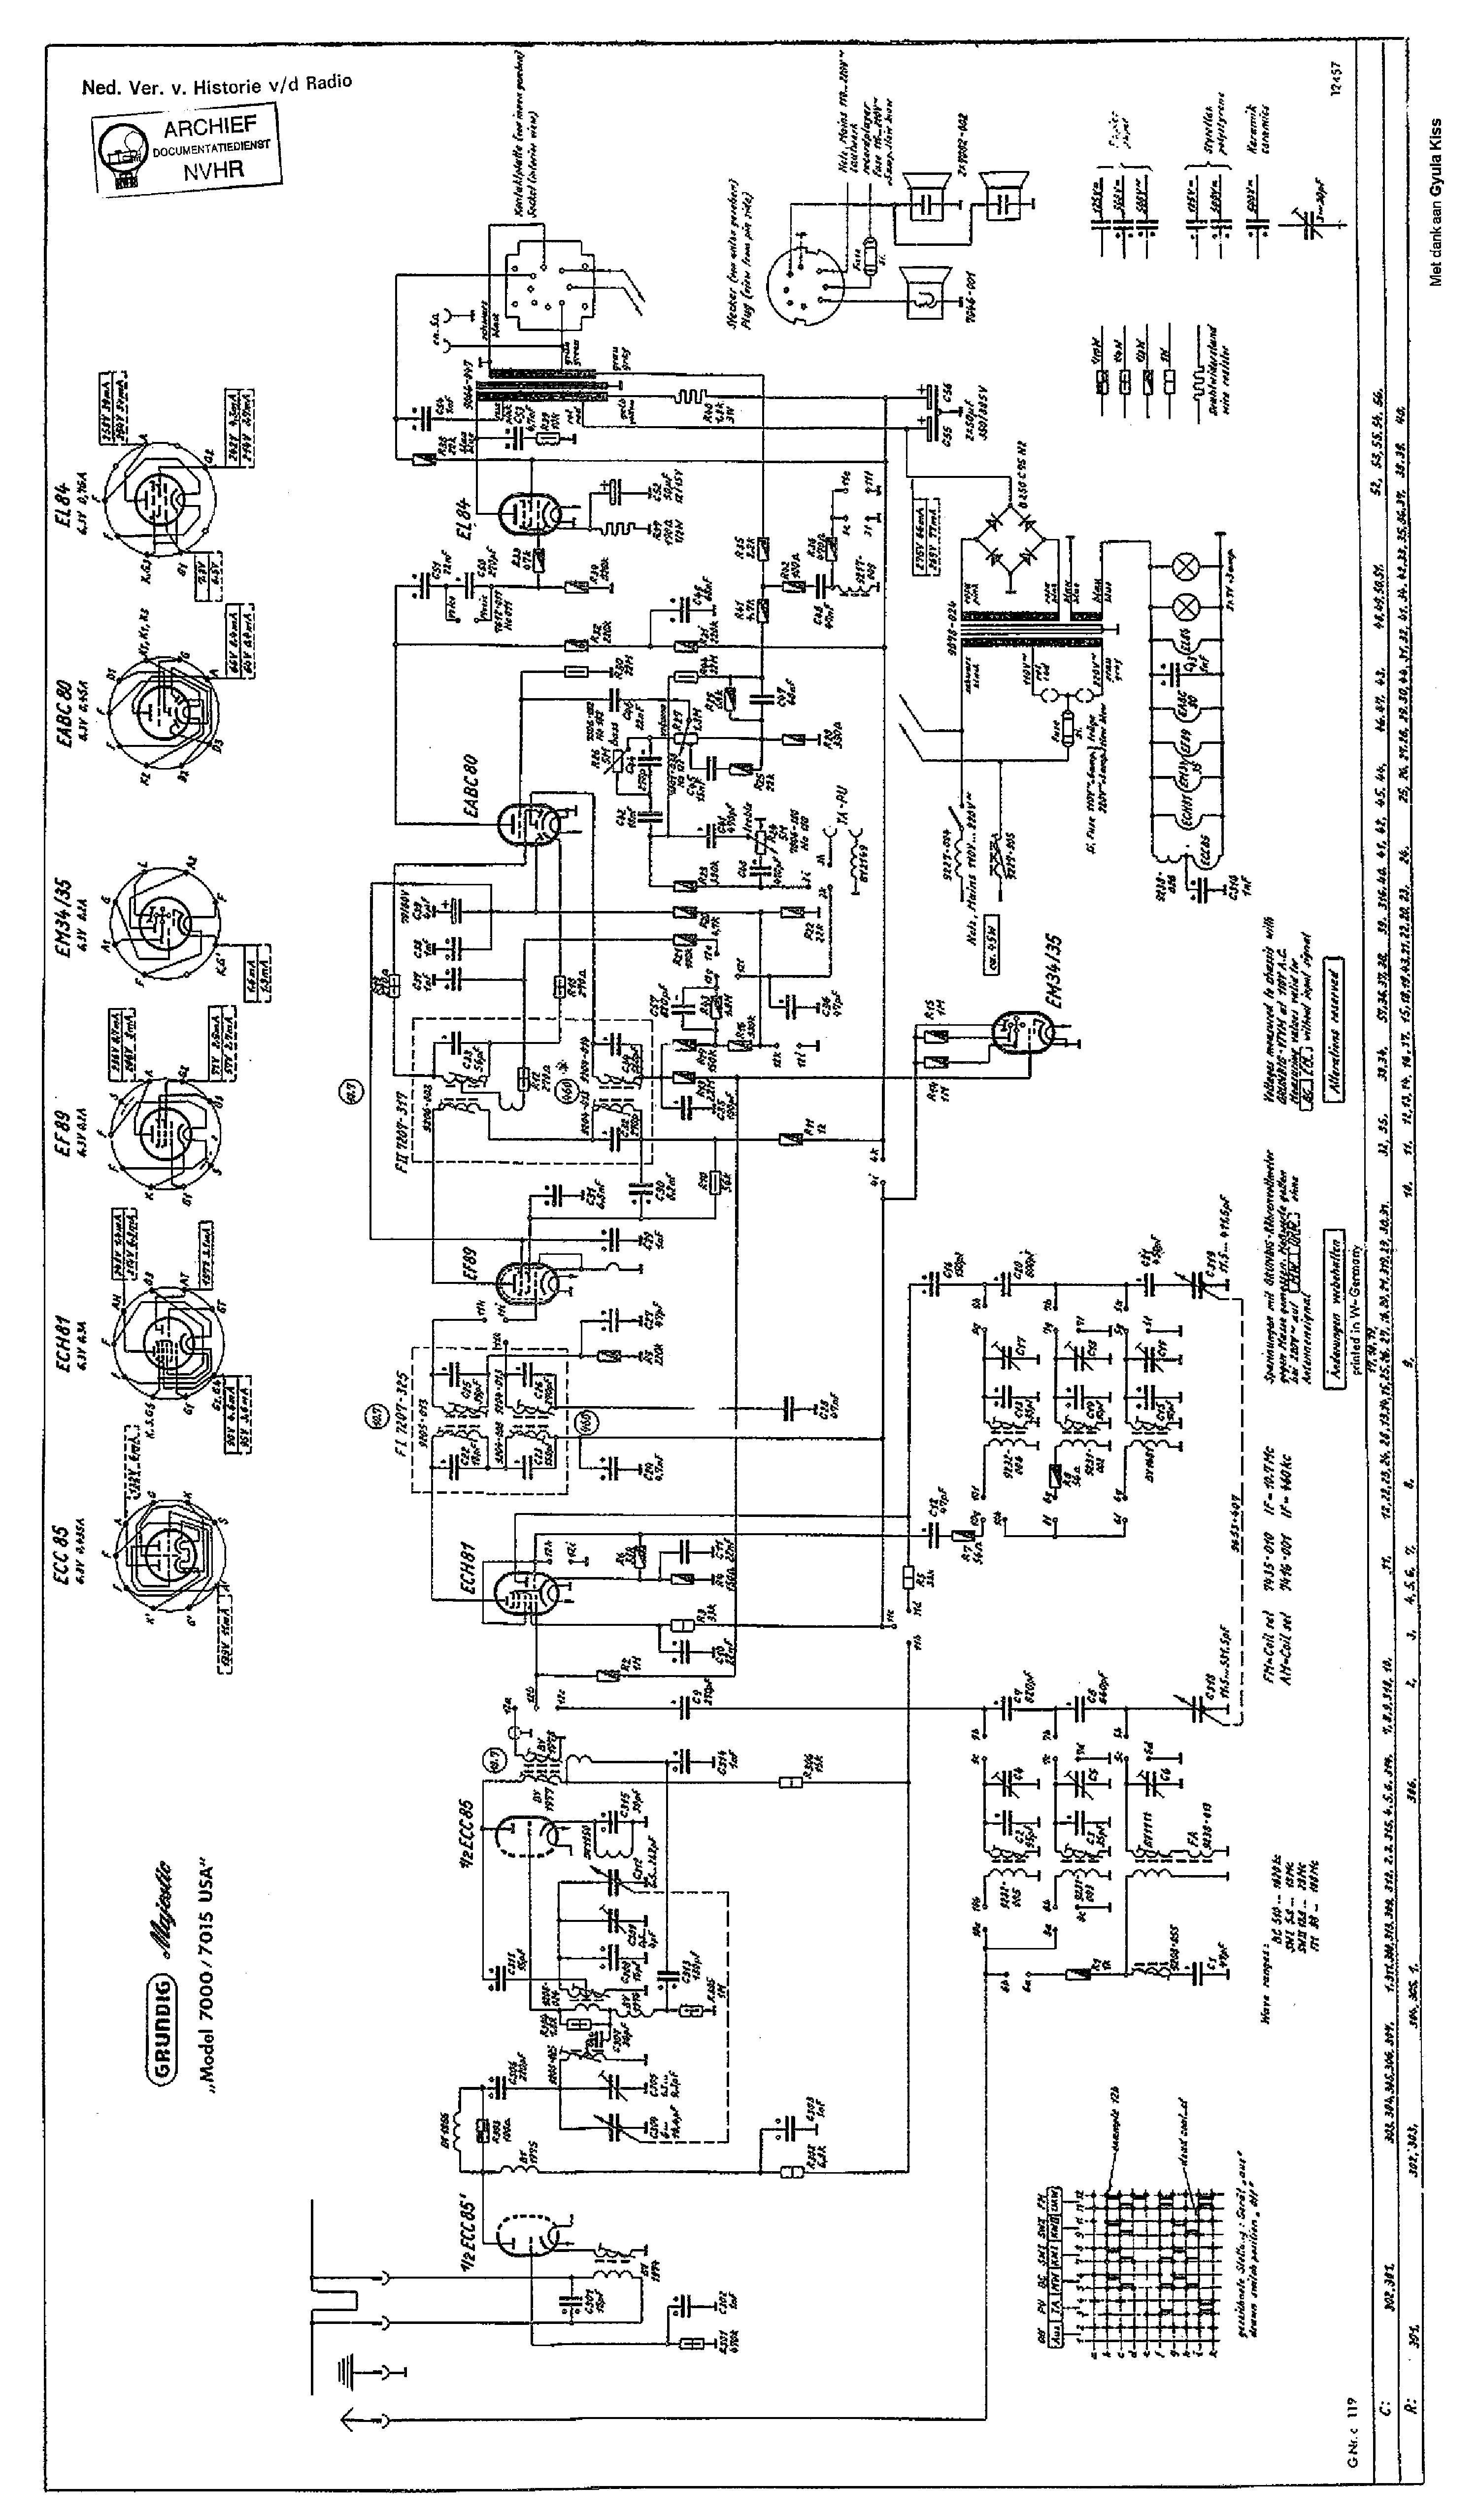 grundig st12 amplifier sch service manual download